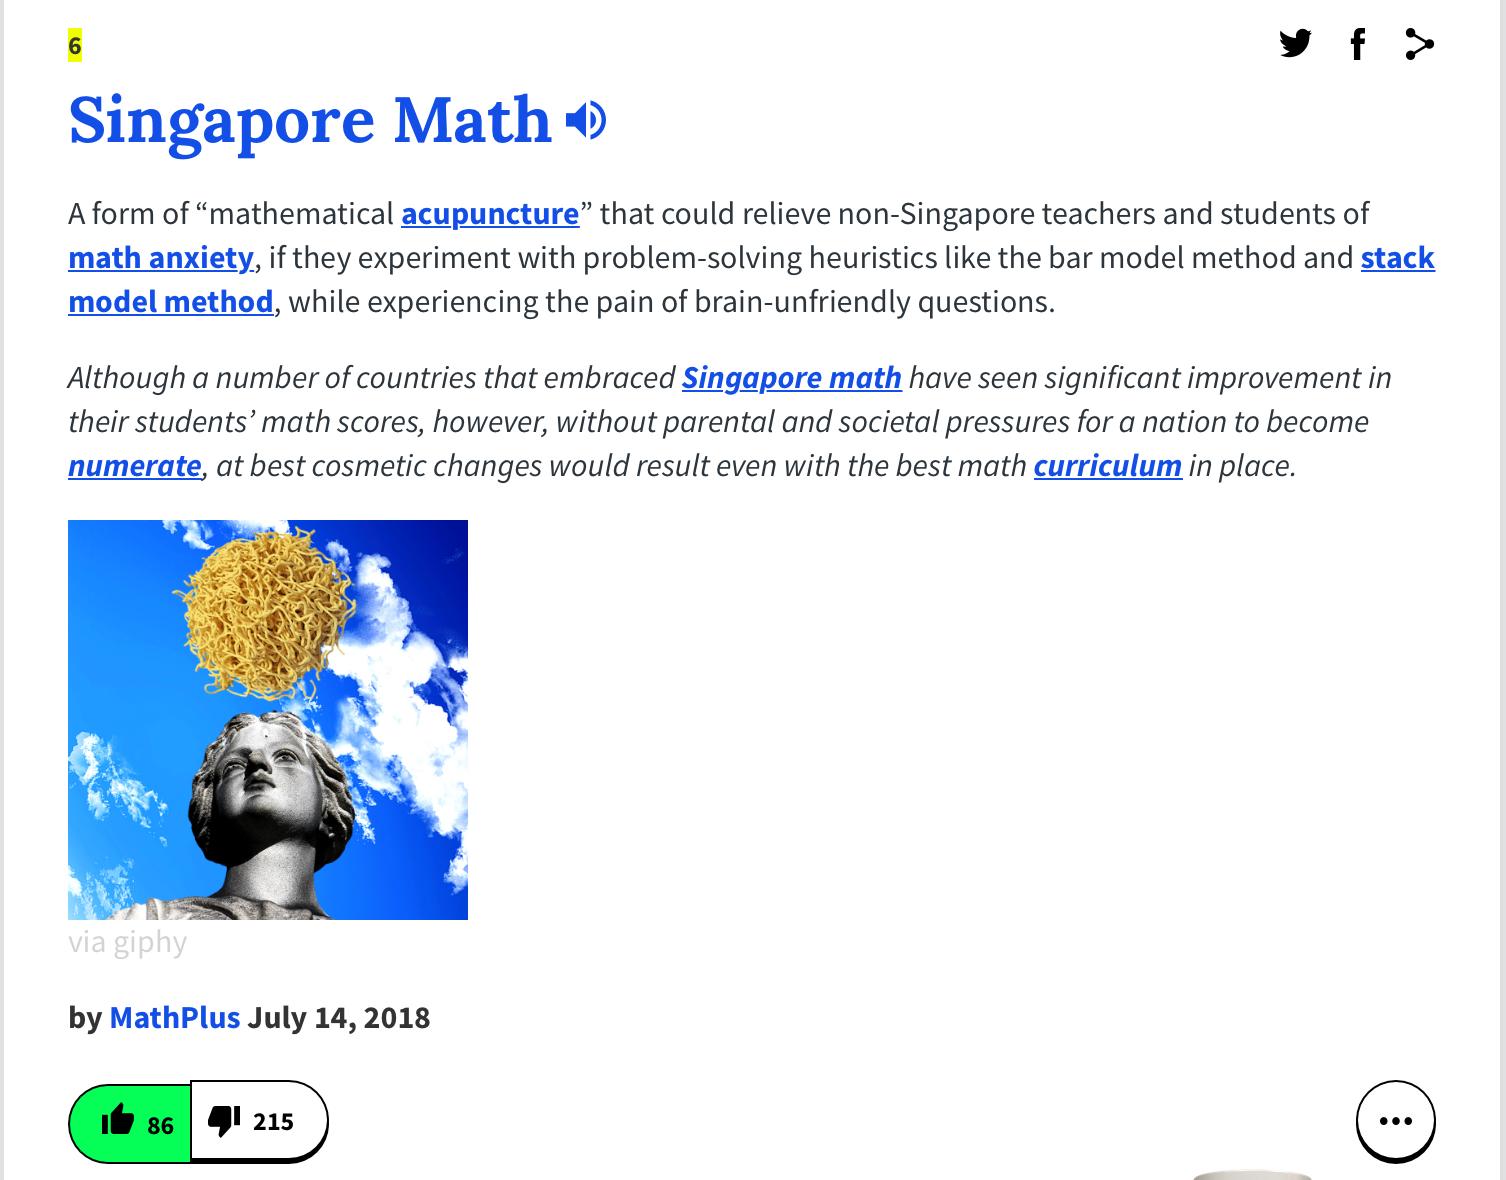 Singapore Math: 2019